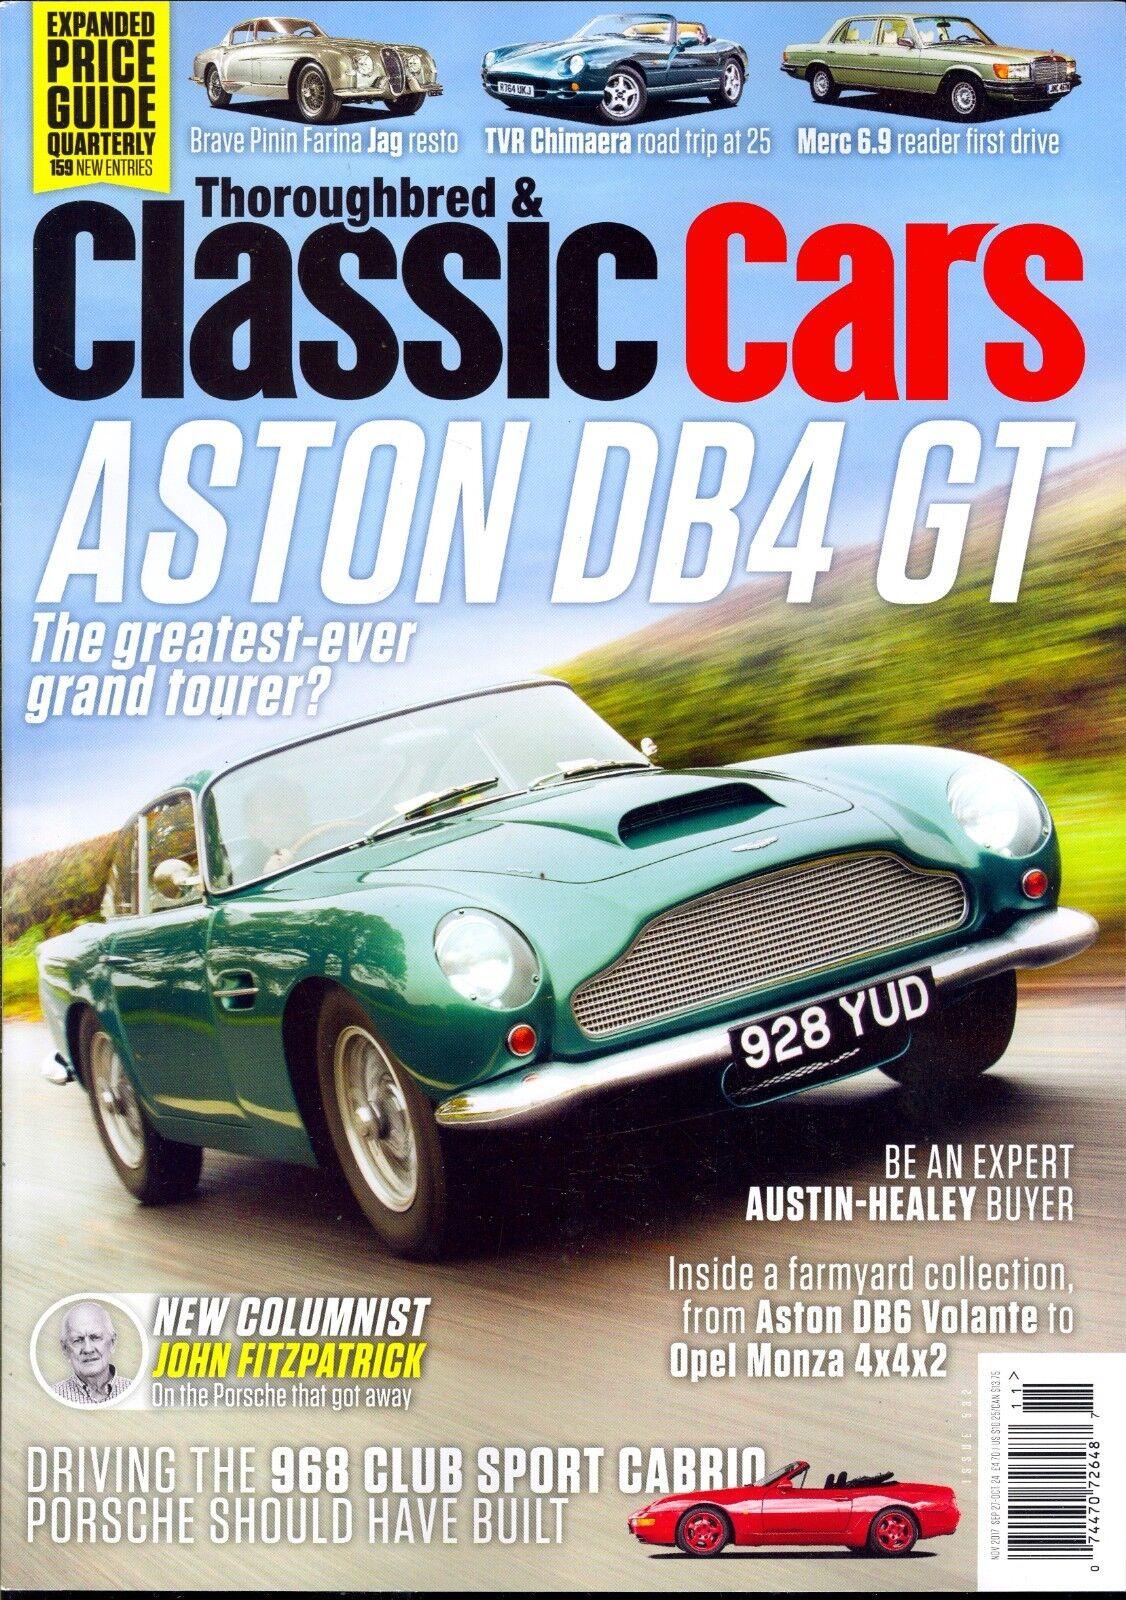 Thoroughbred & Classic Cars Magazine Issue October 2017 | eBay